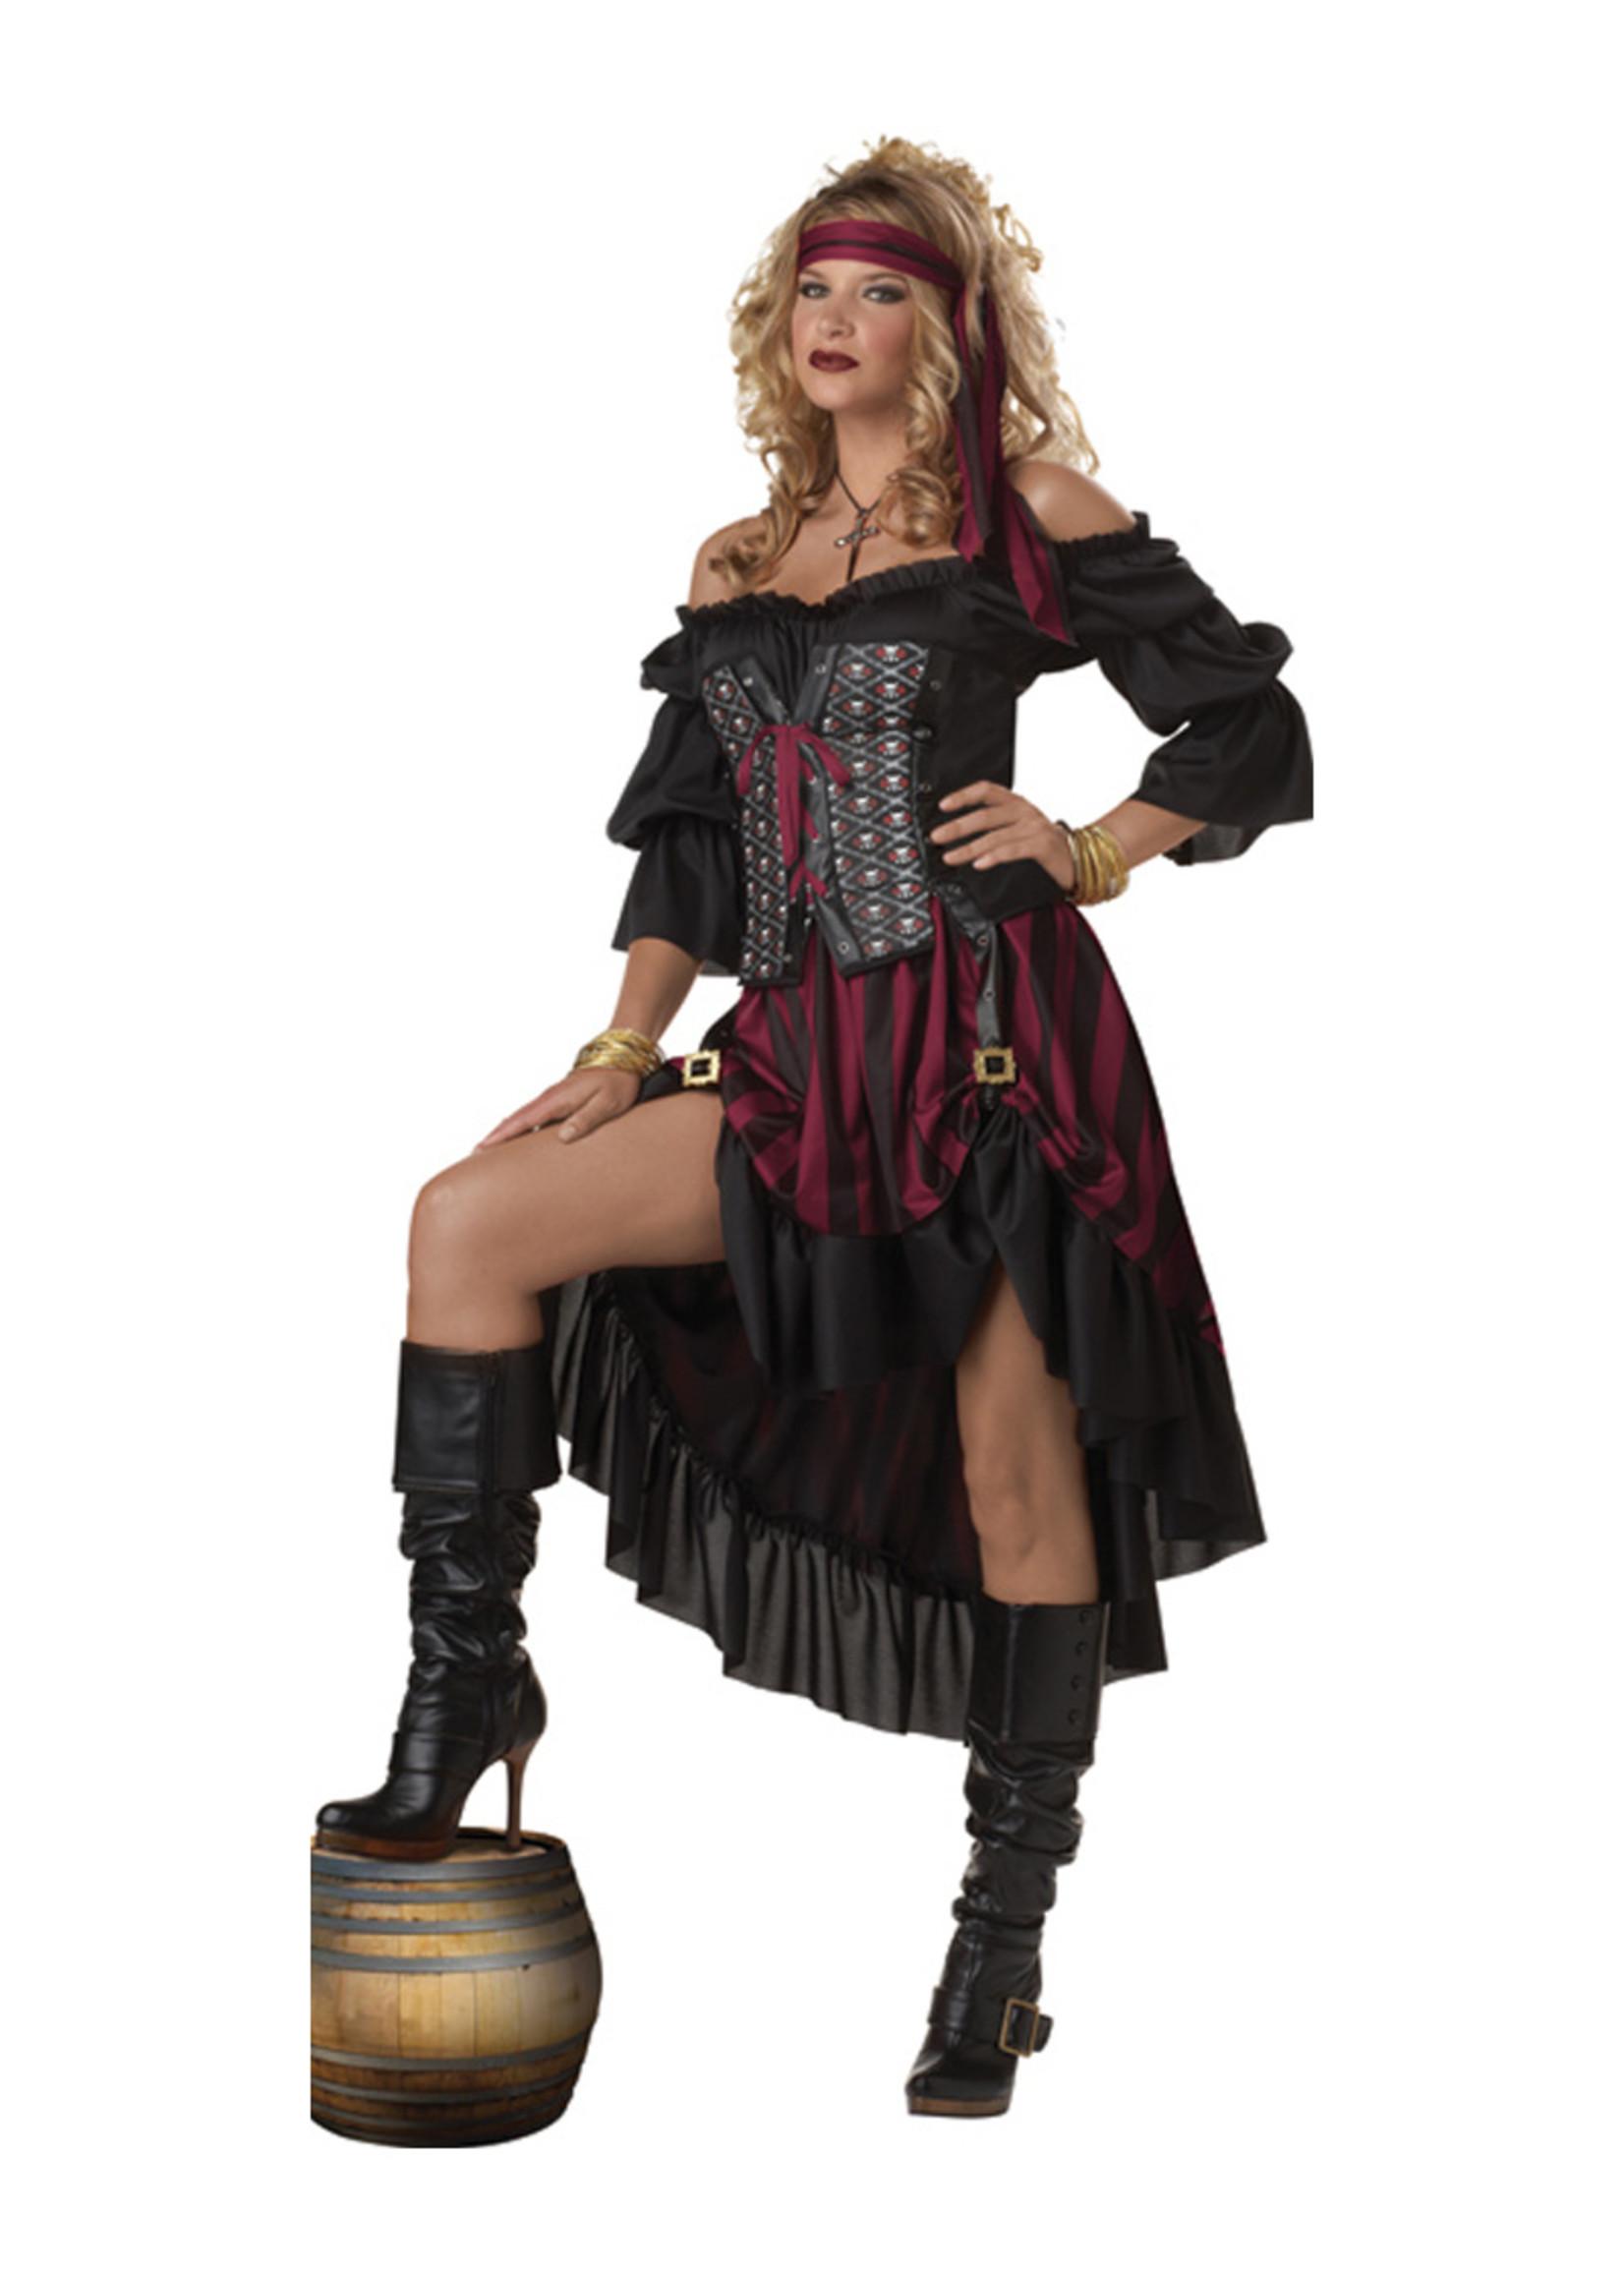 Pirate Wench Costume - Women's